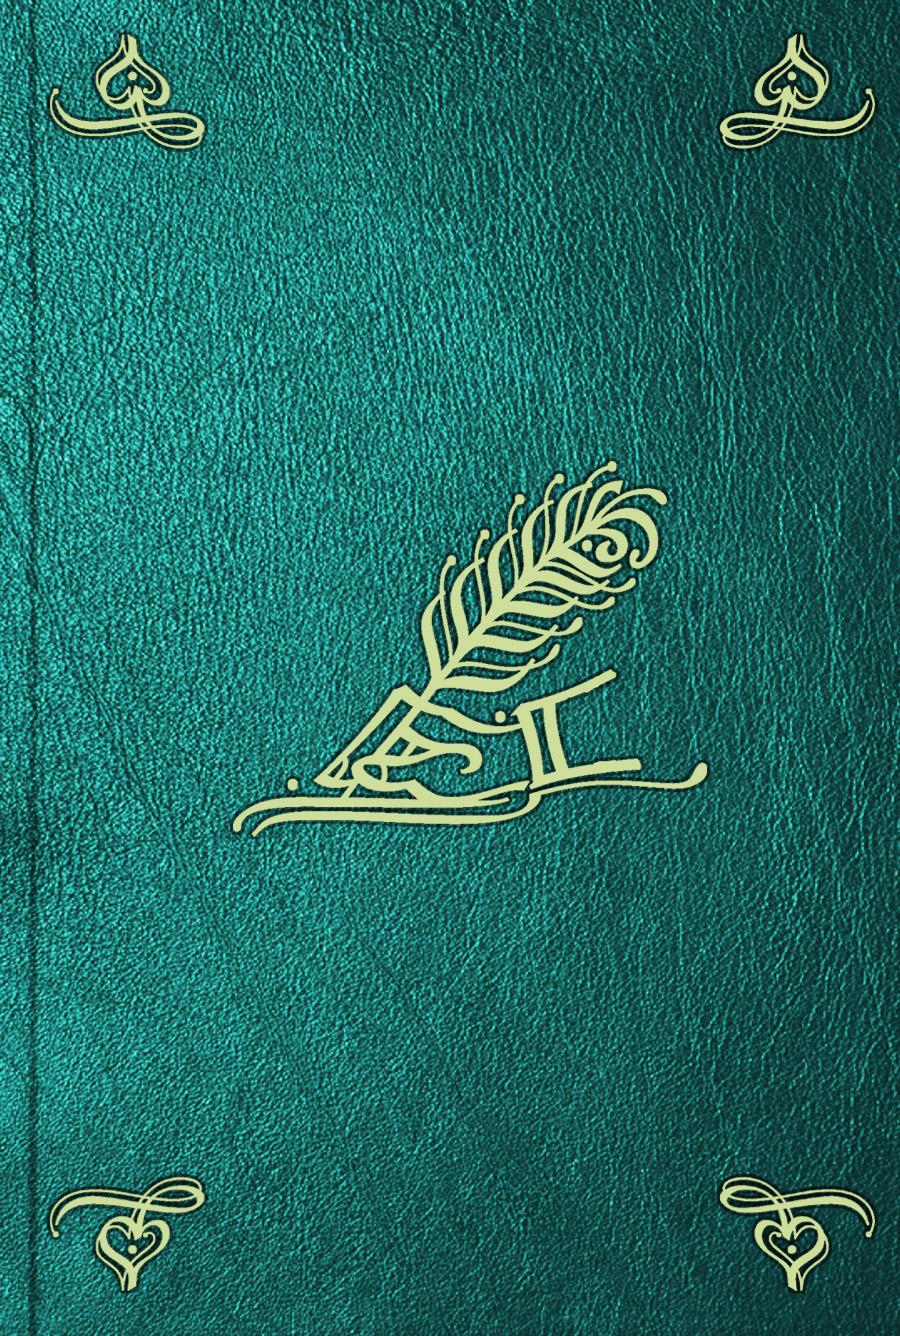 Отсутствует Cornelius Nepos de Vita excellentium imperatorum philips hd 2392 00 daily collection белая